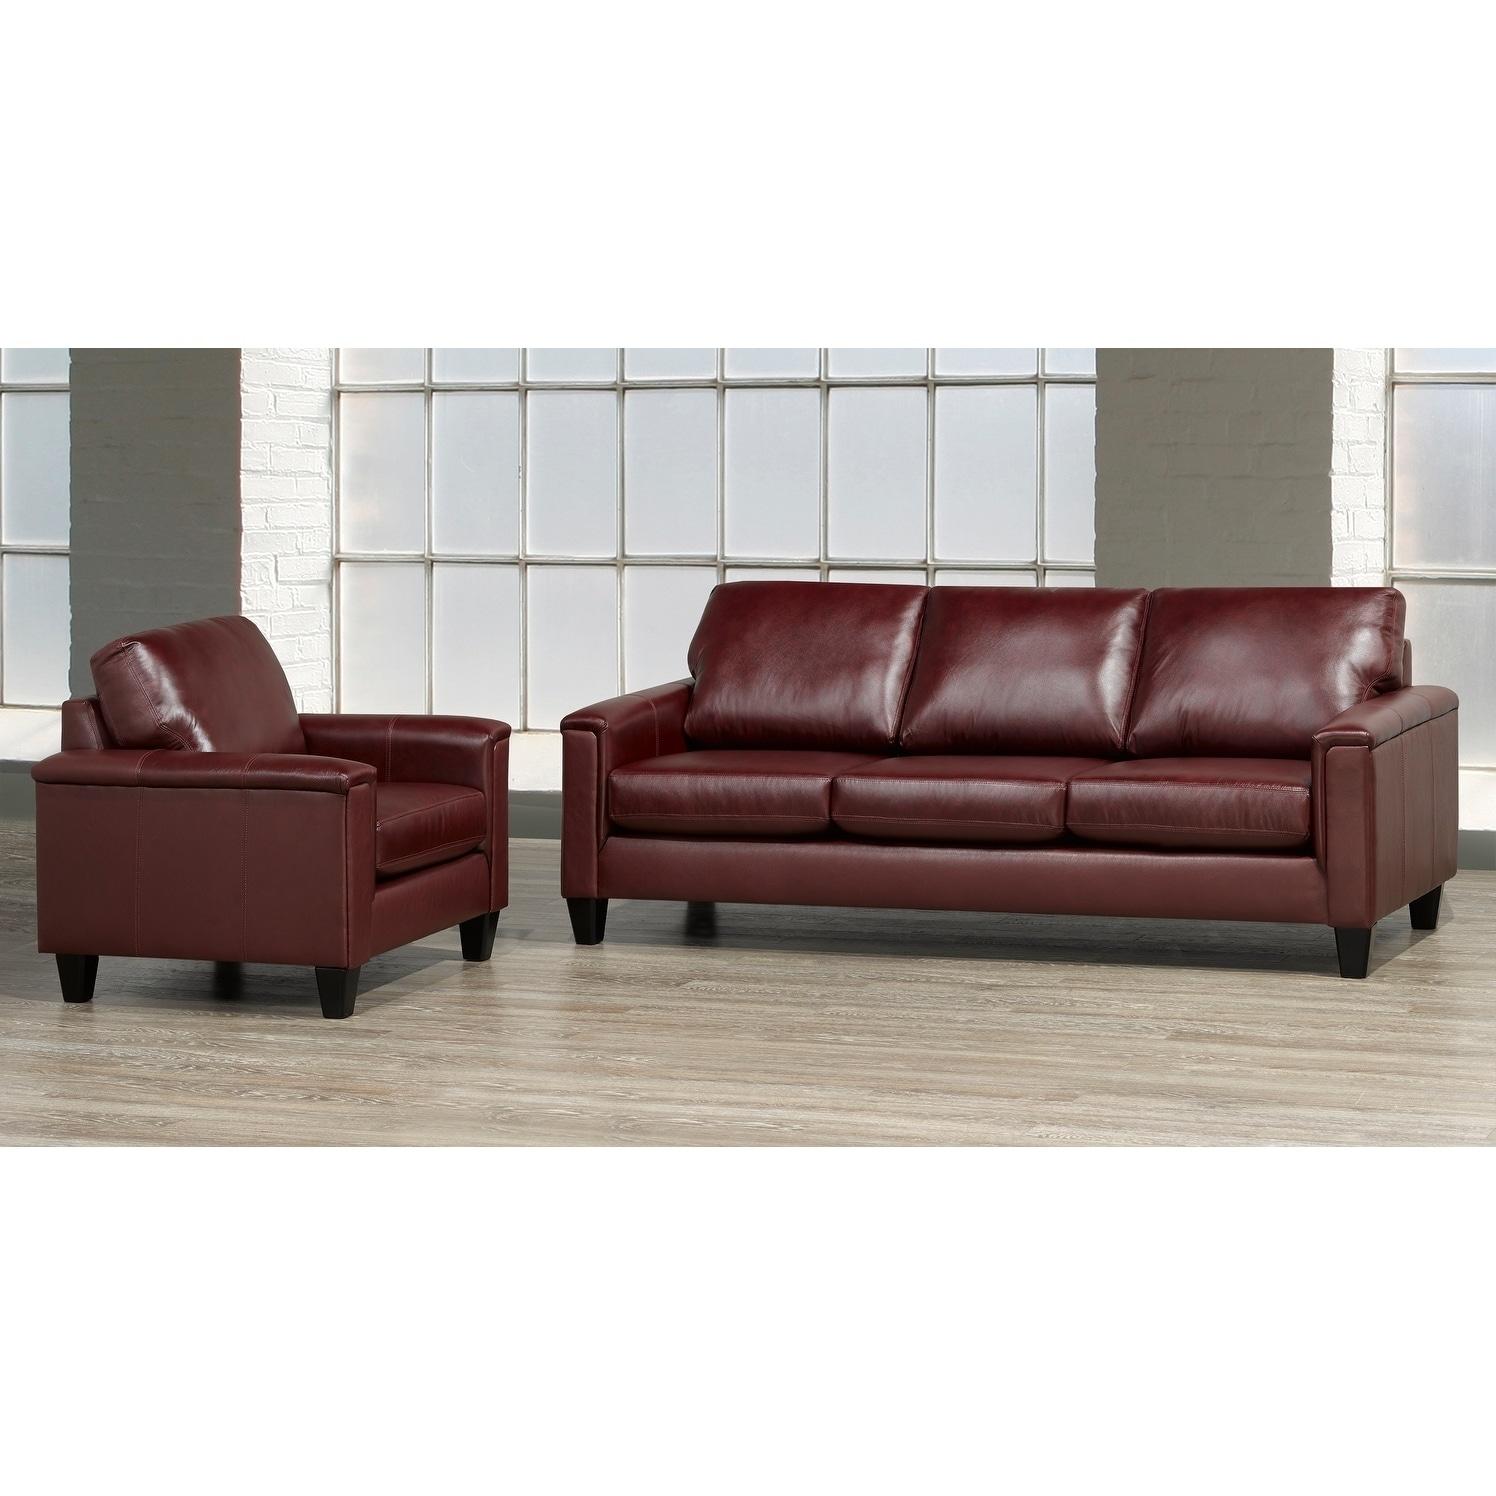 Auckland Top Grain Leather Sofa And Armchair Set